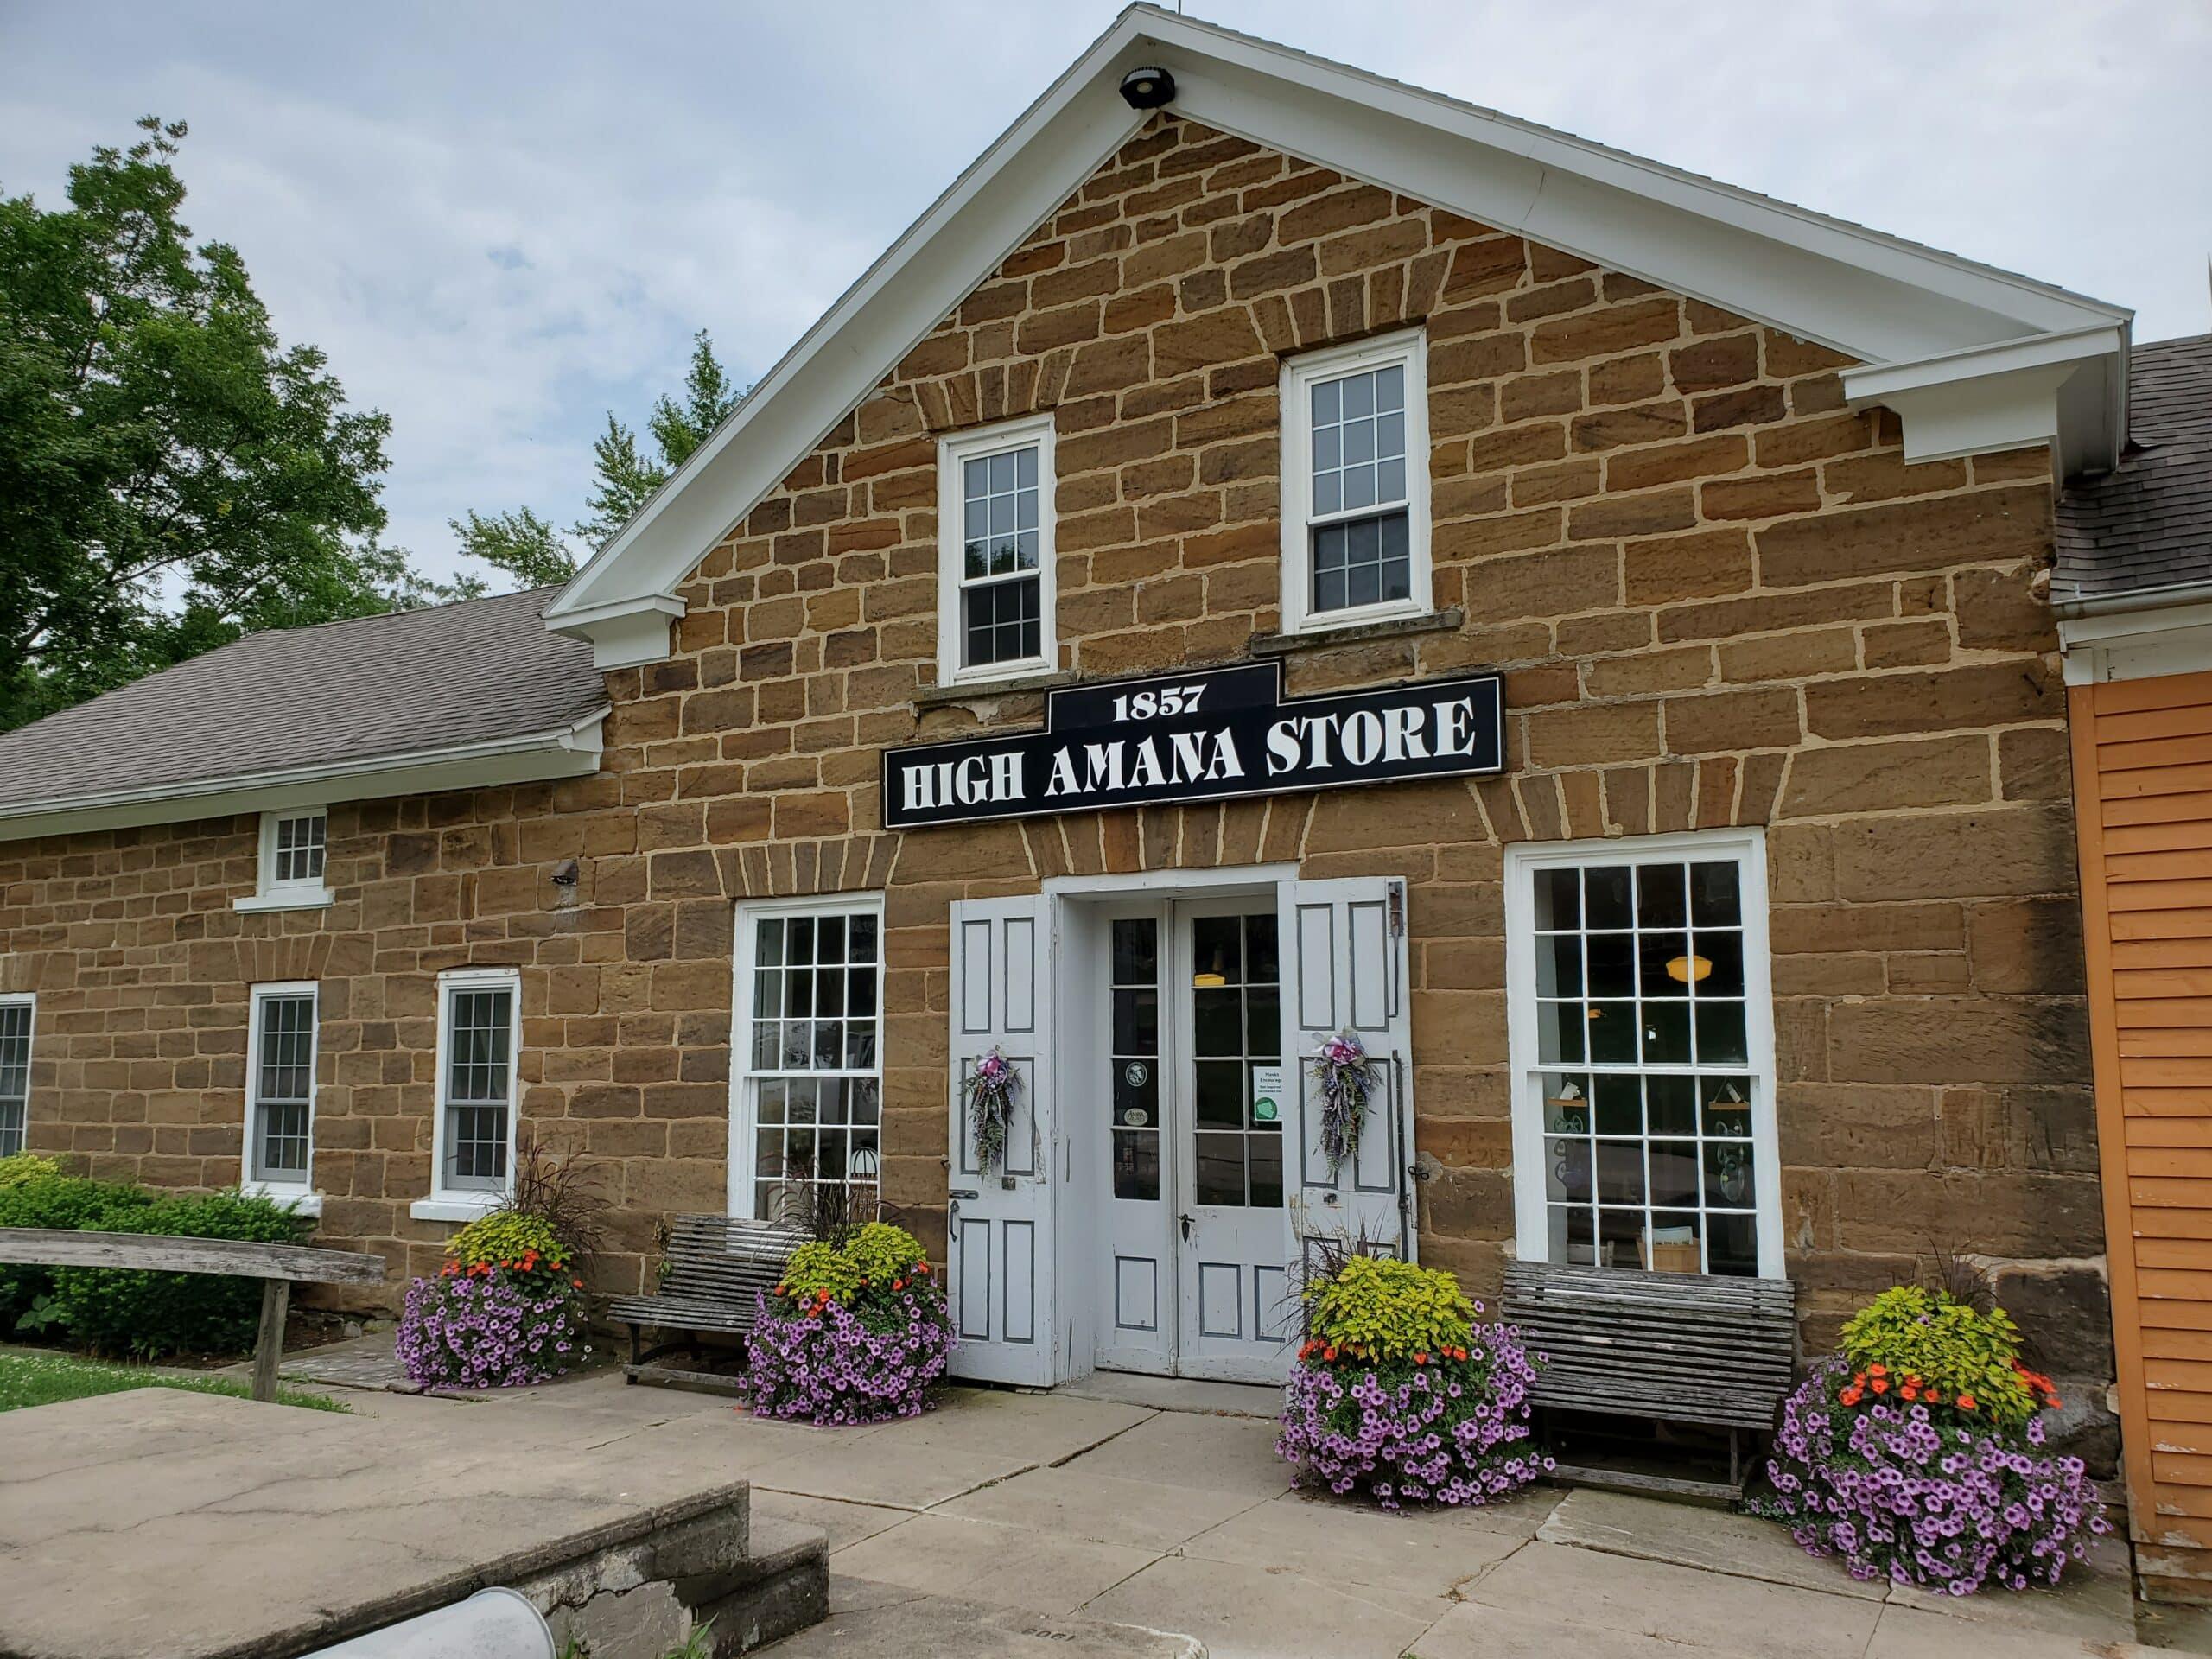 High Amana Store